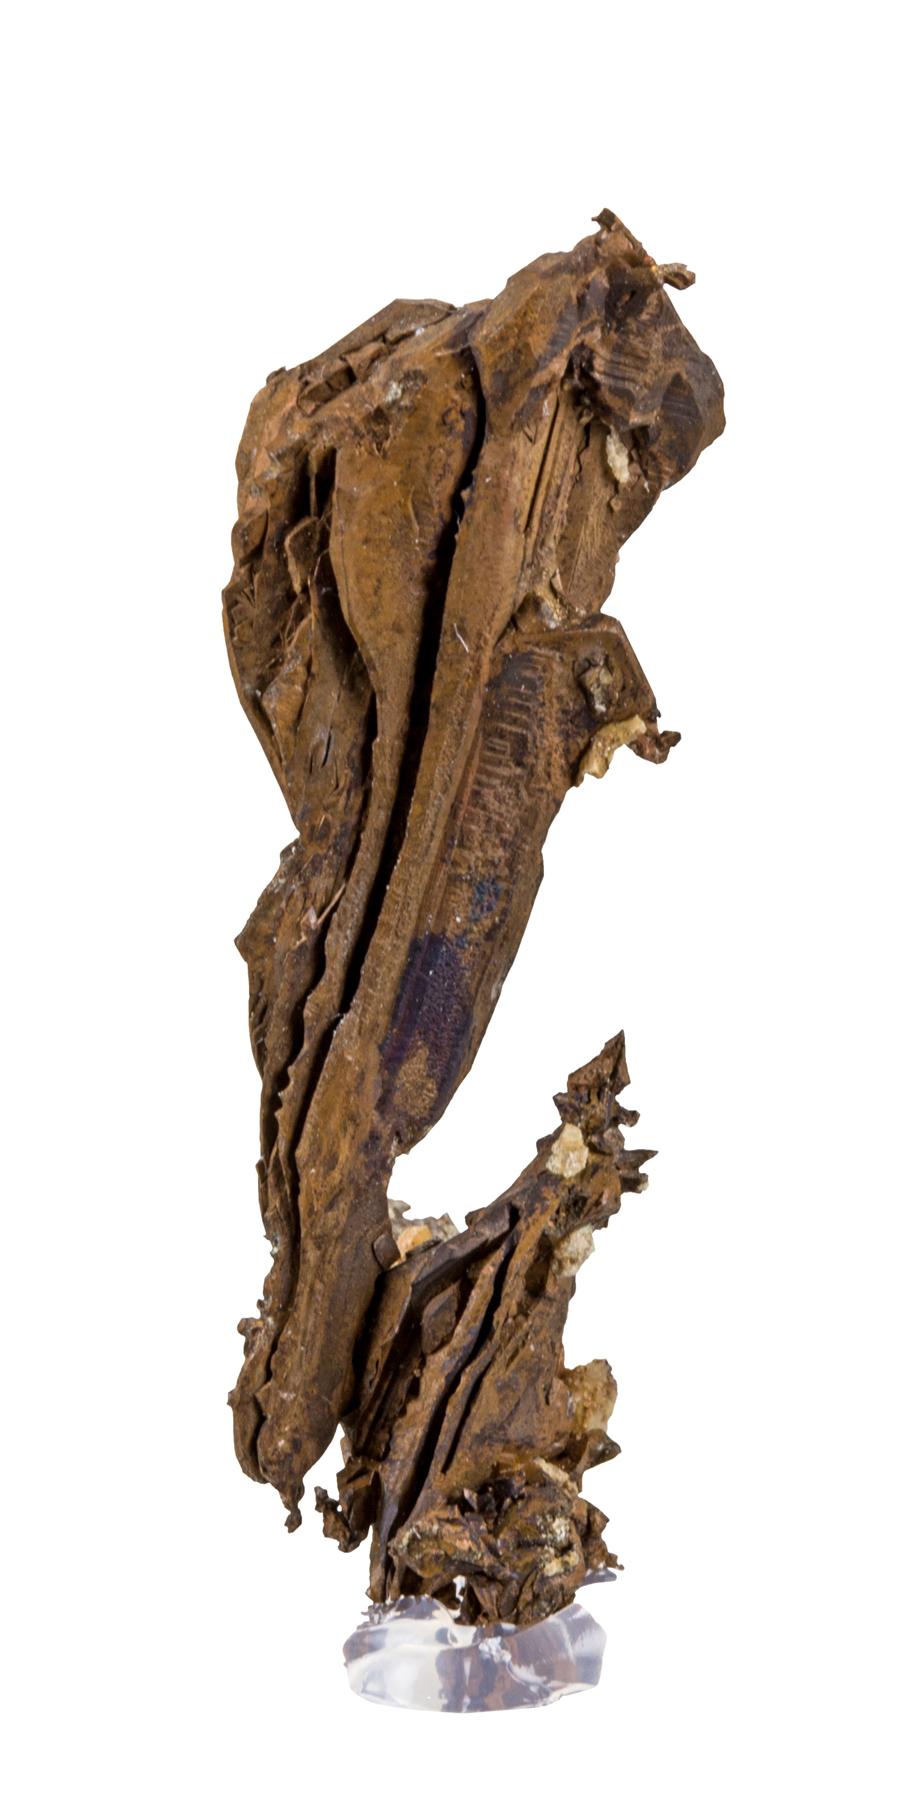 A fine toenail cluster Copper crystals 1740 Bench Ray Mine Arizona